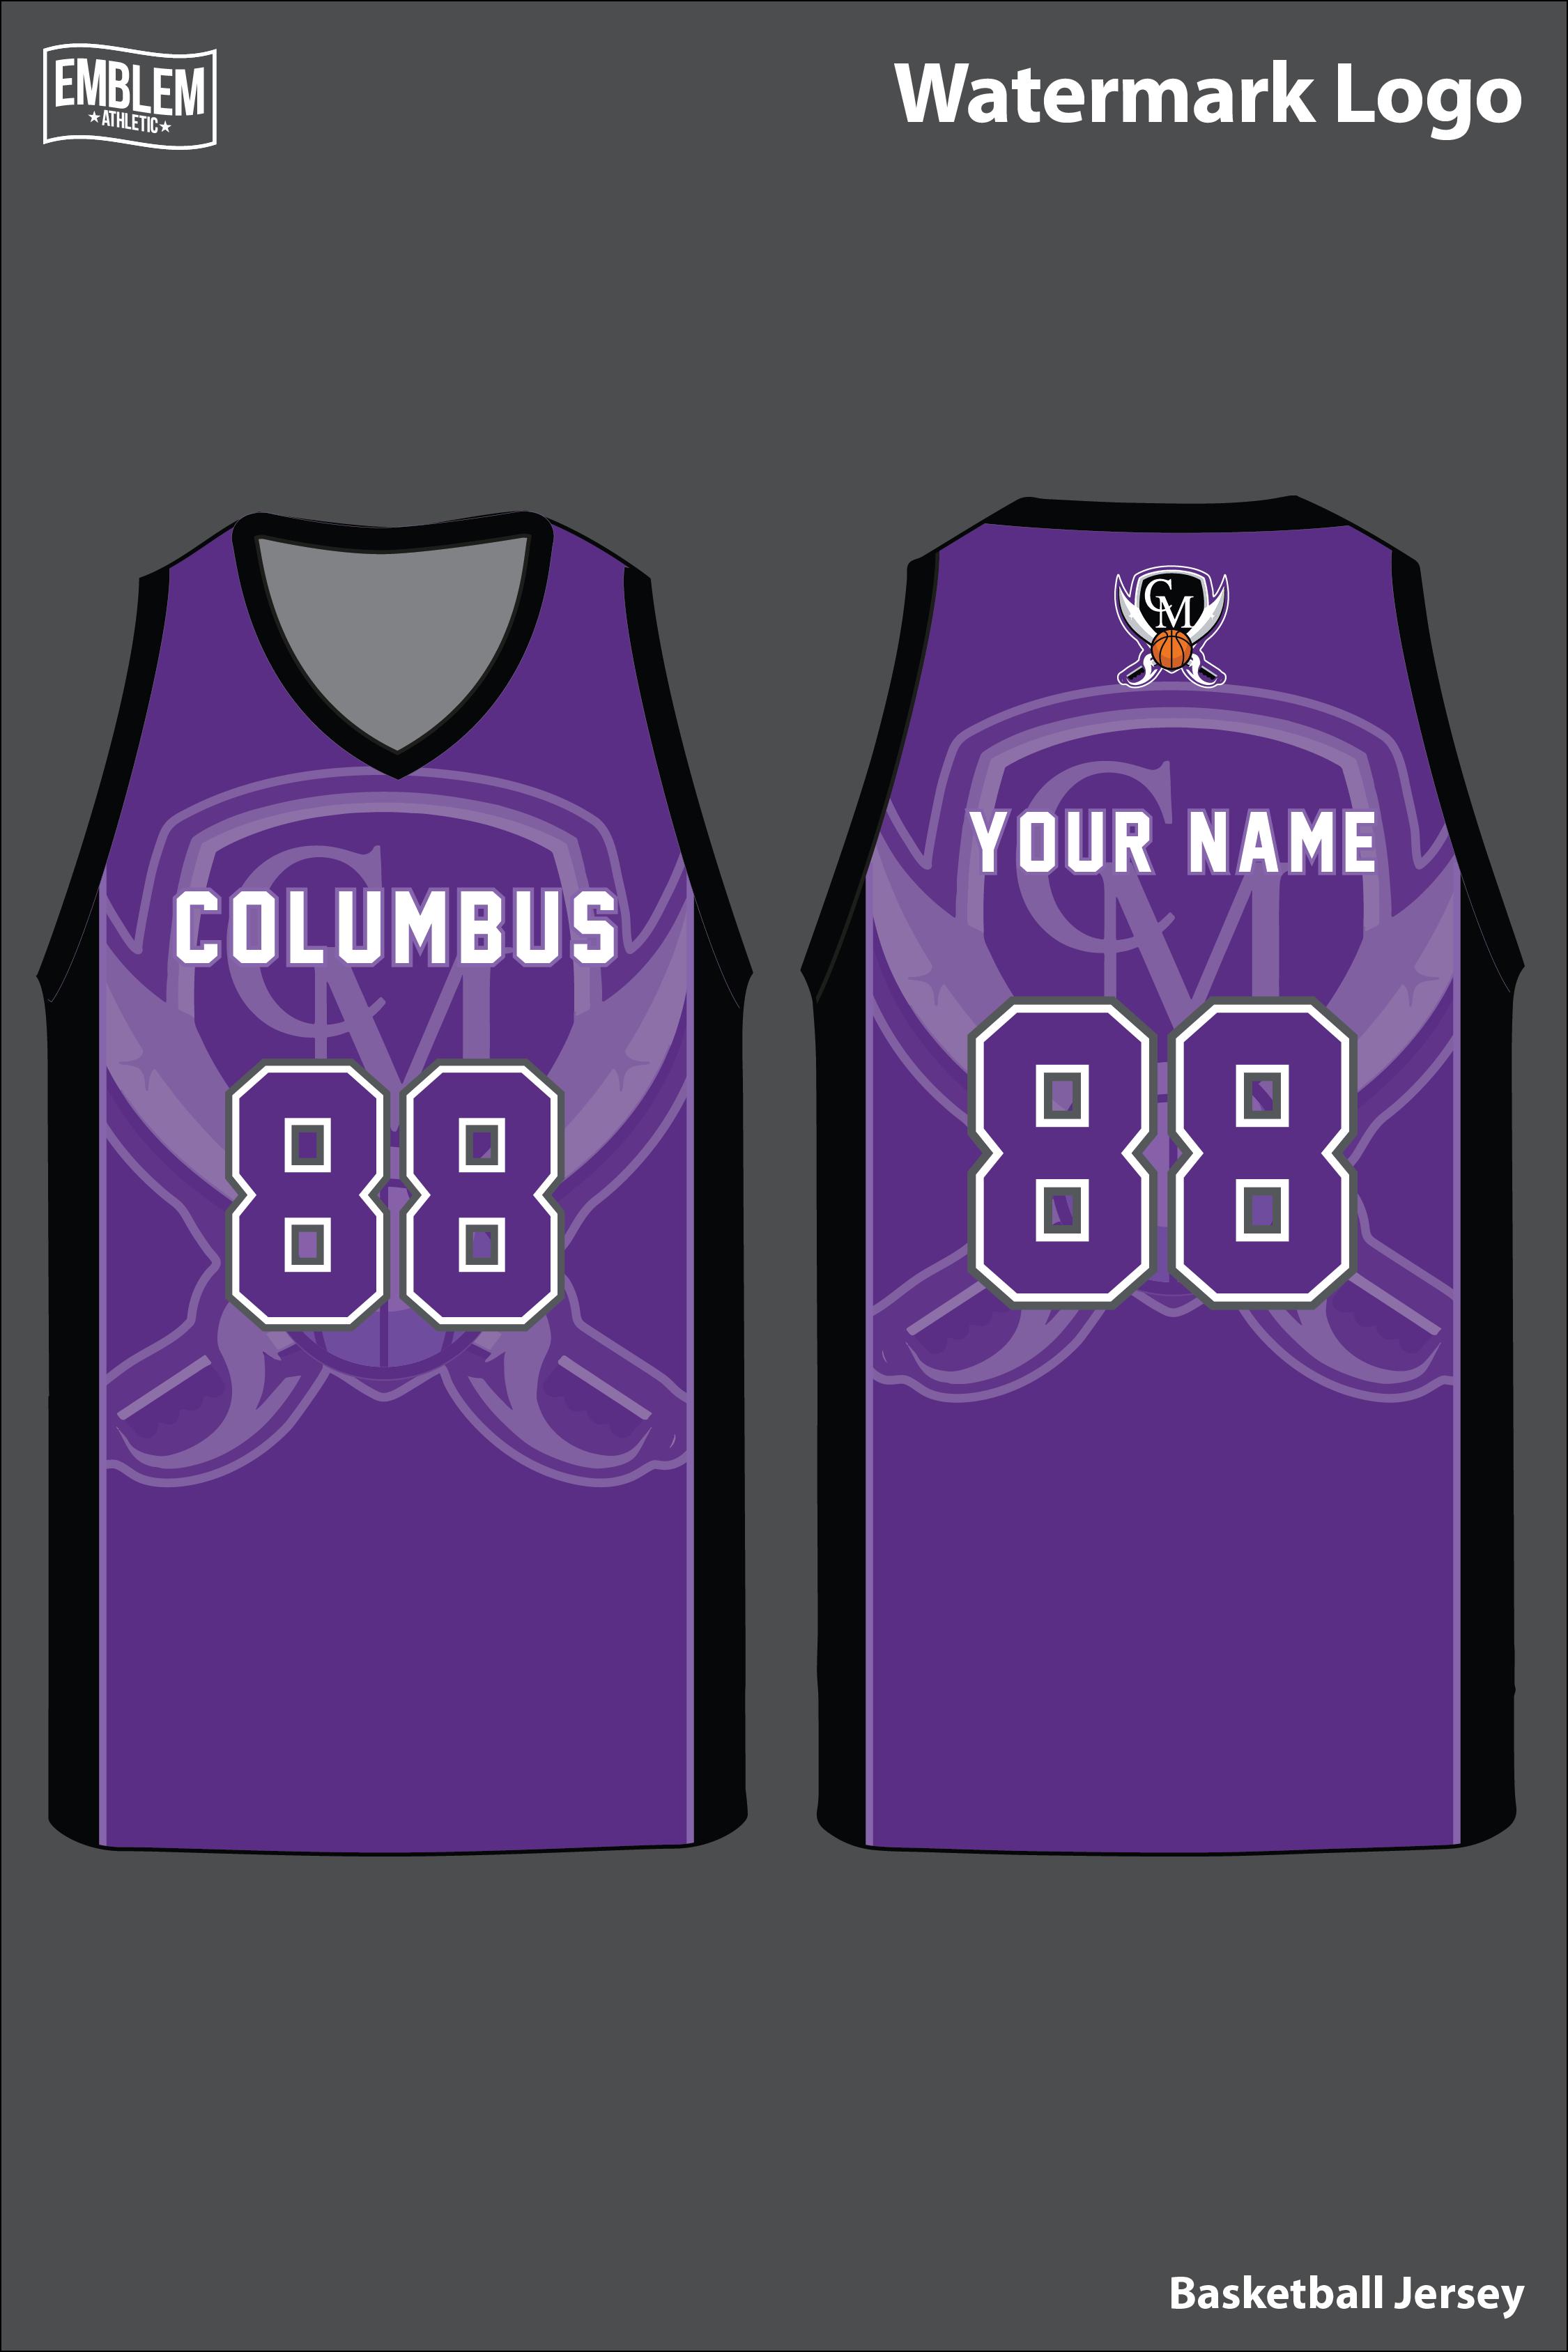 Emblem - Basketball Jersey - Watermark Logo-01.png